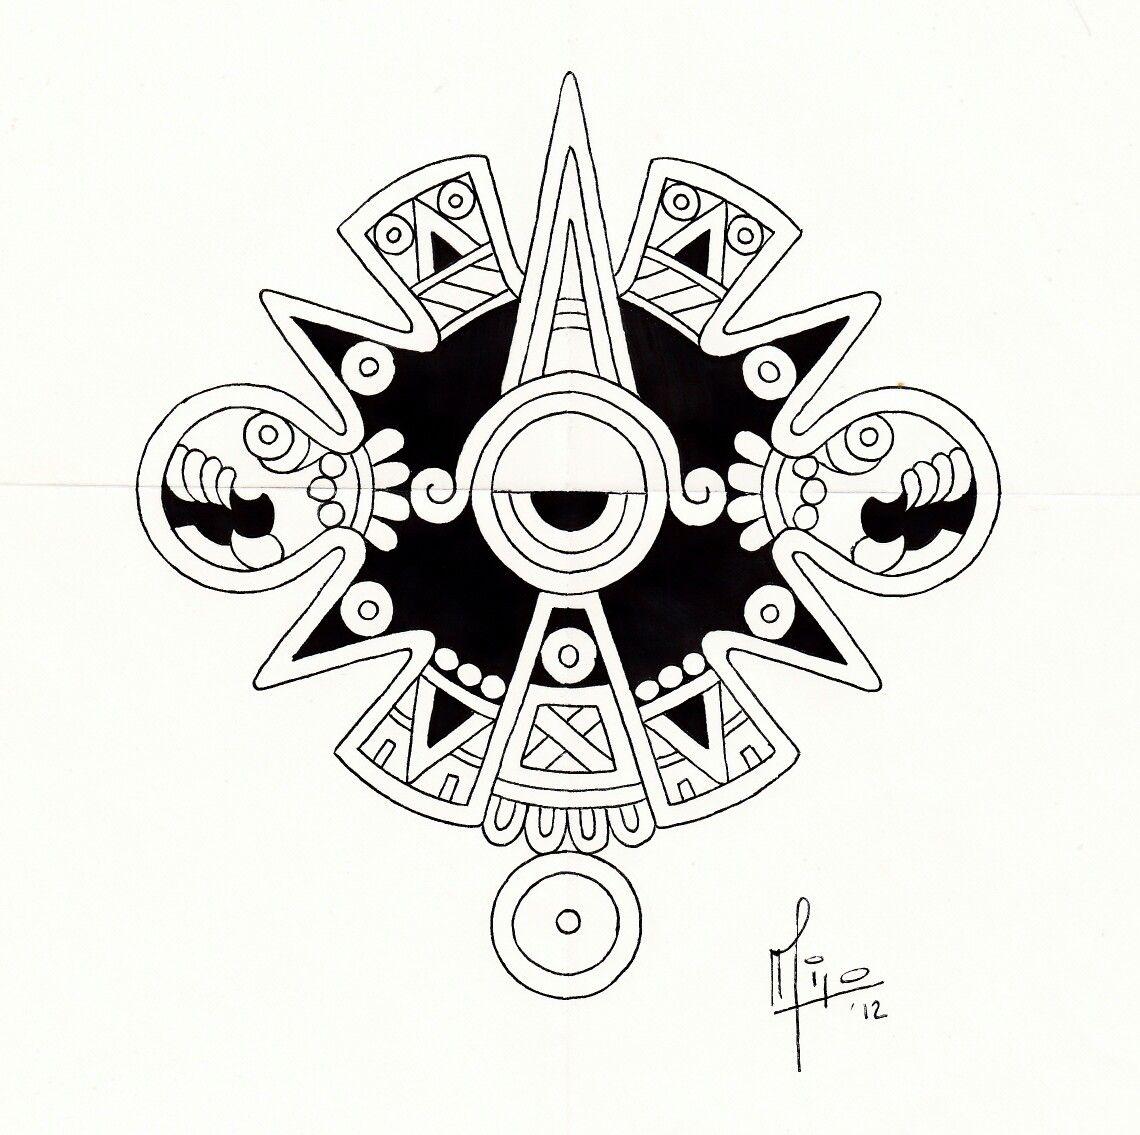 Sol Azteca Diseño Para Tatuaje Milo Diseños Para Tatuajes